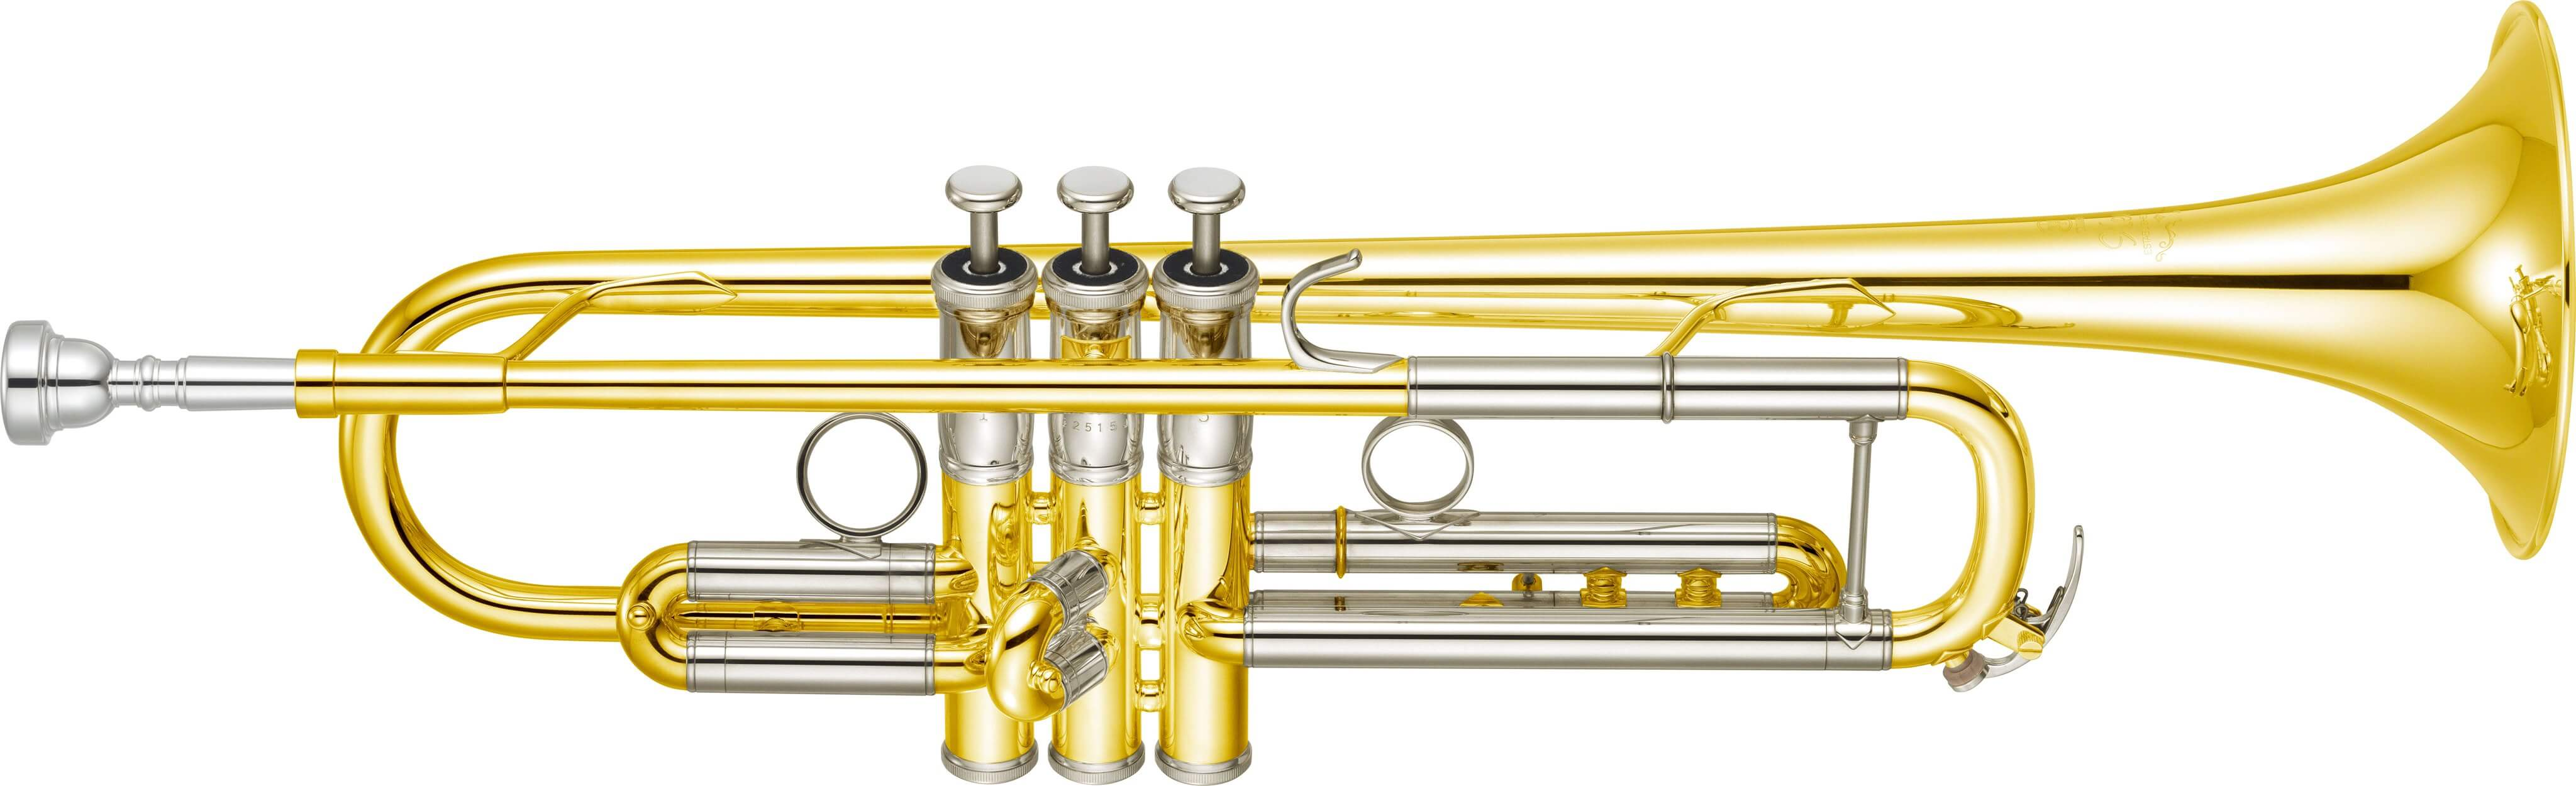 Trompeta Yamaha Ytr-8345Rs Plateada